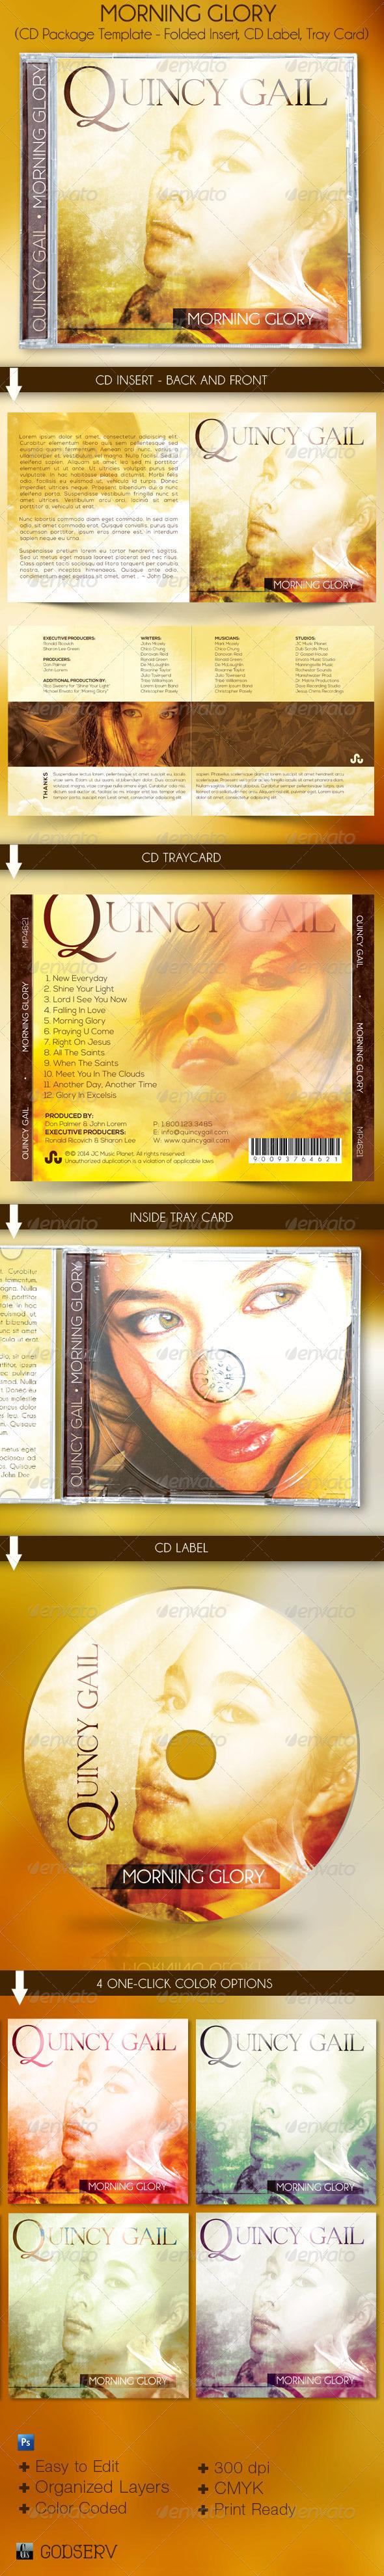 Morning Glory CD Artwork Template - CD & DVD Artwork Print Templates